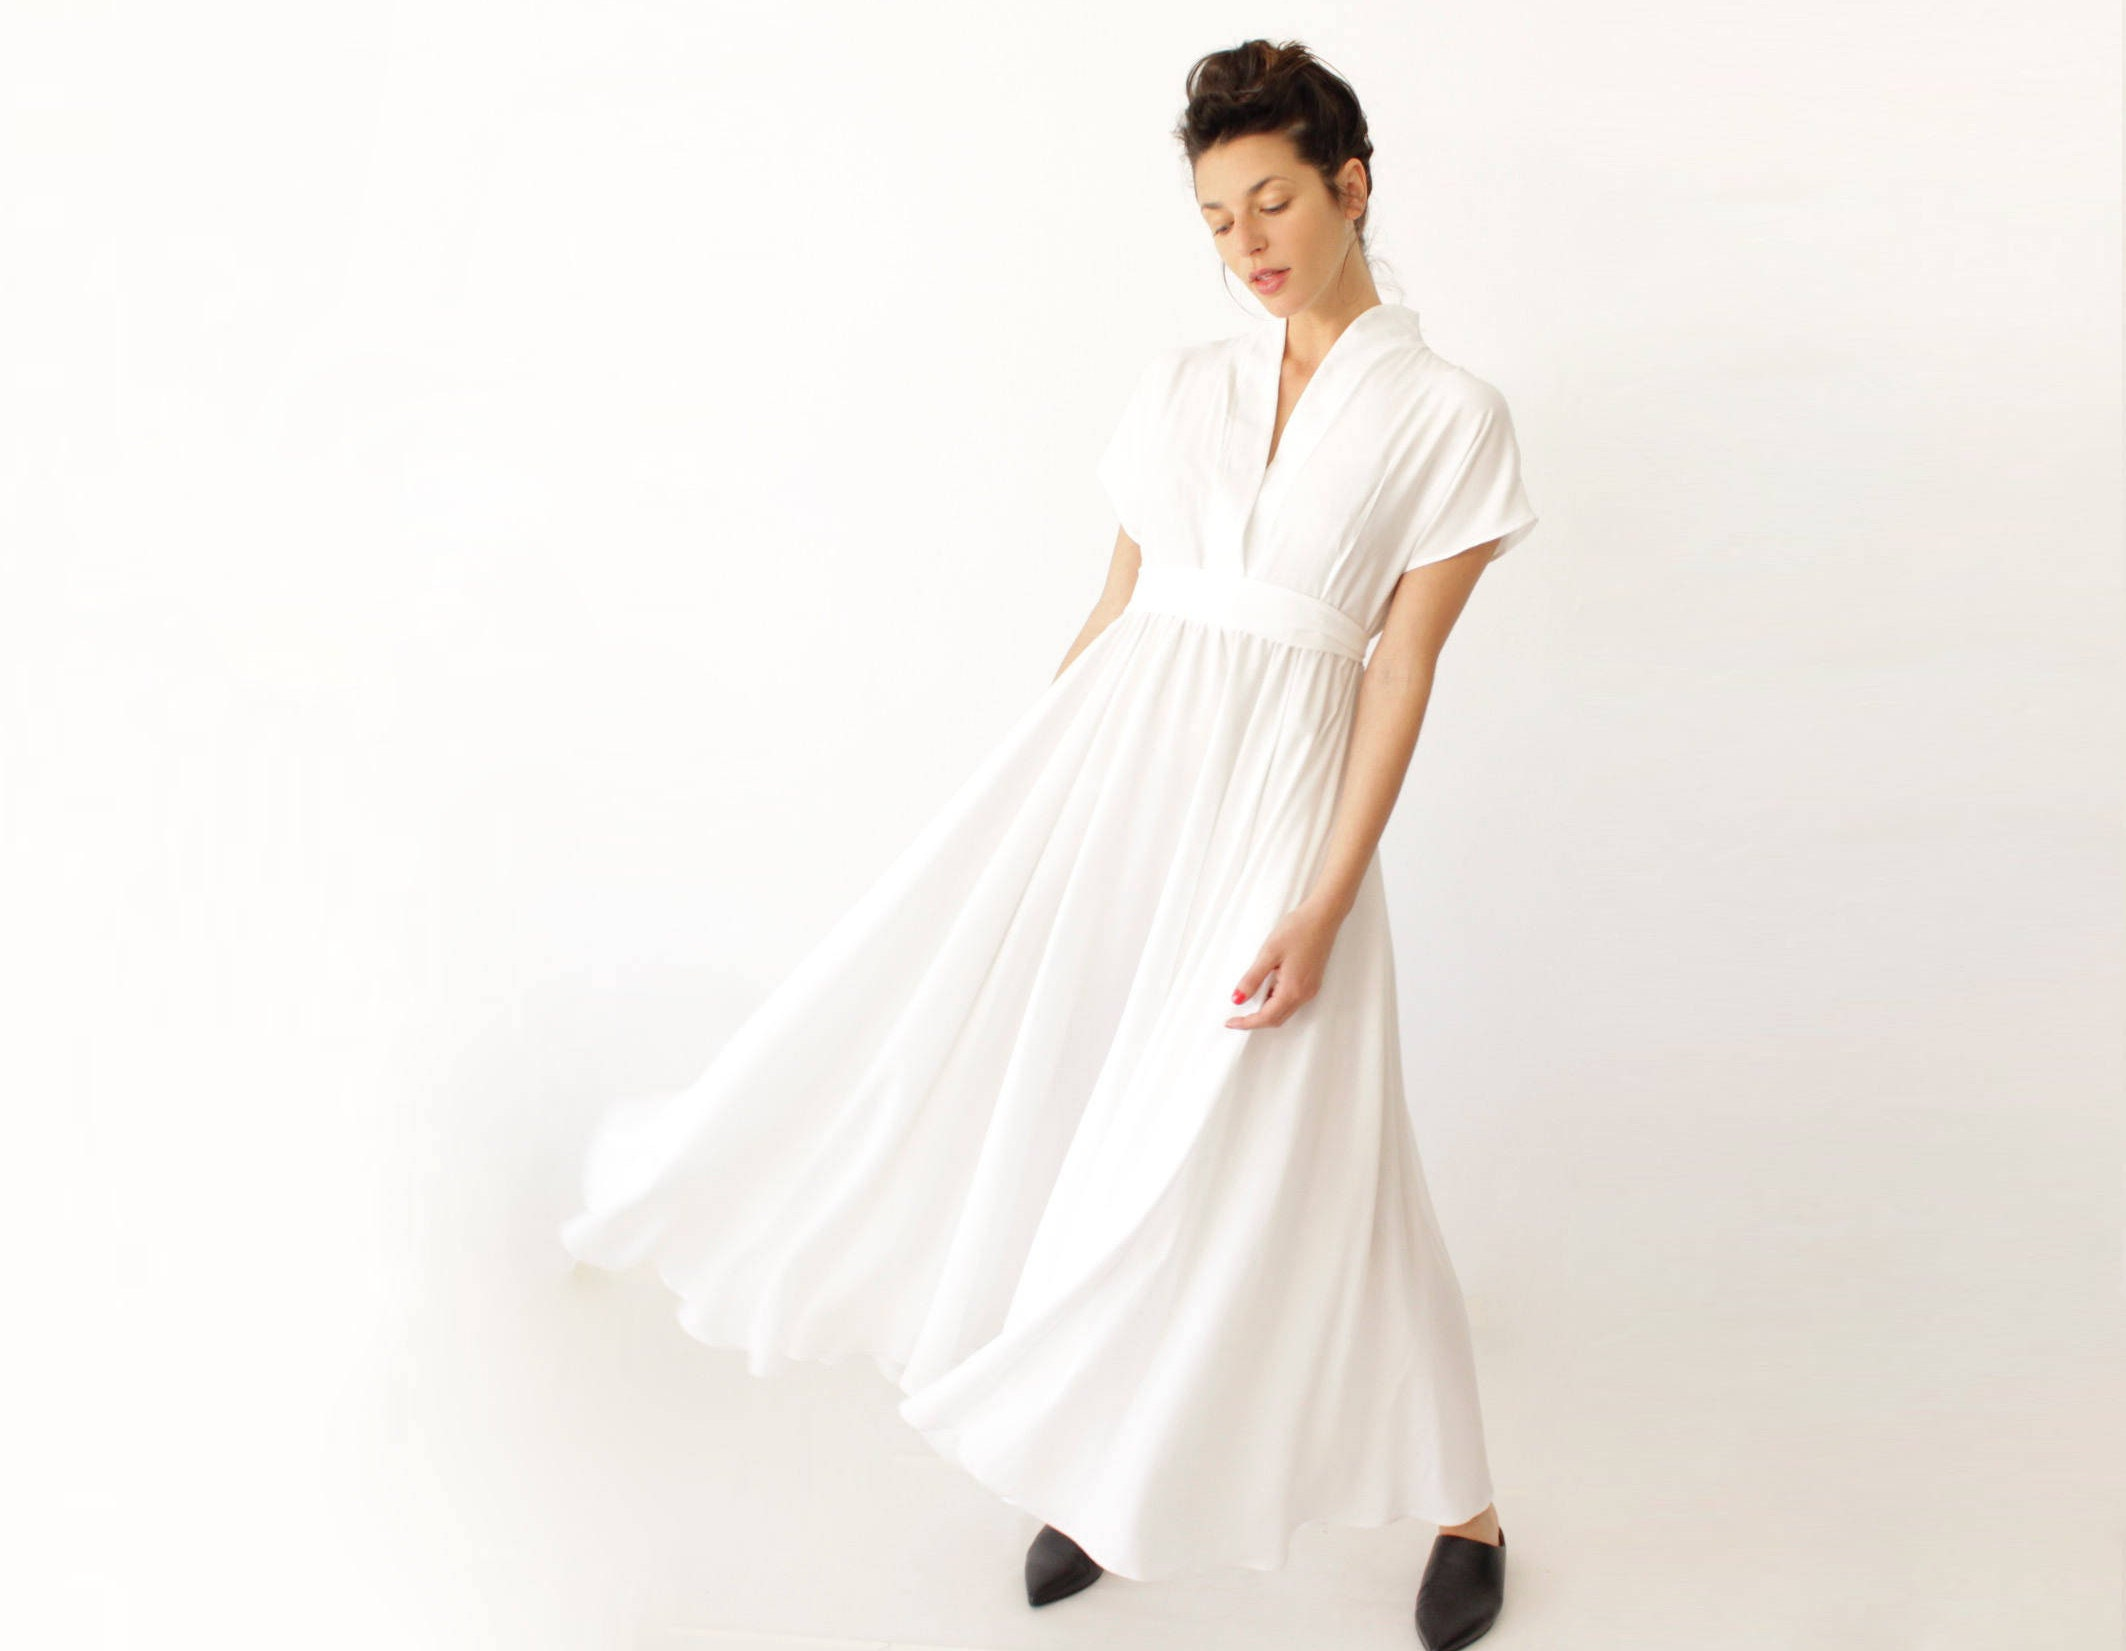 50: Long White Dresses Summer Wedding At Websimilar.org